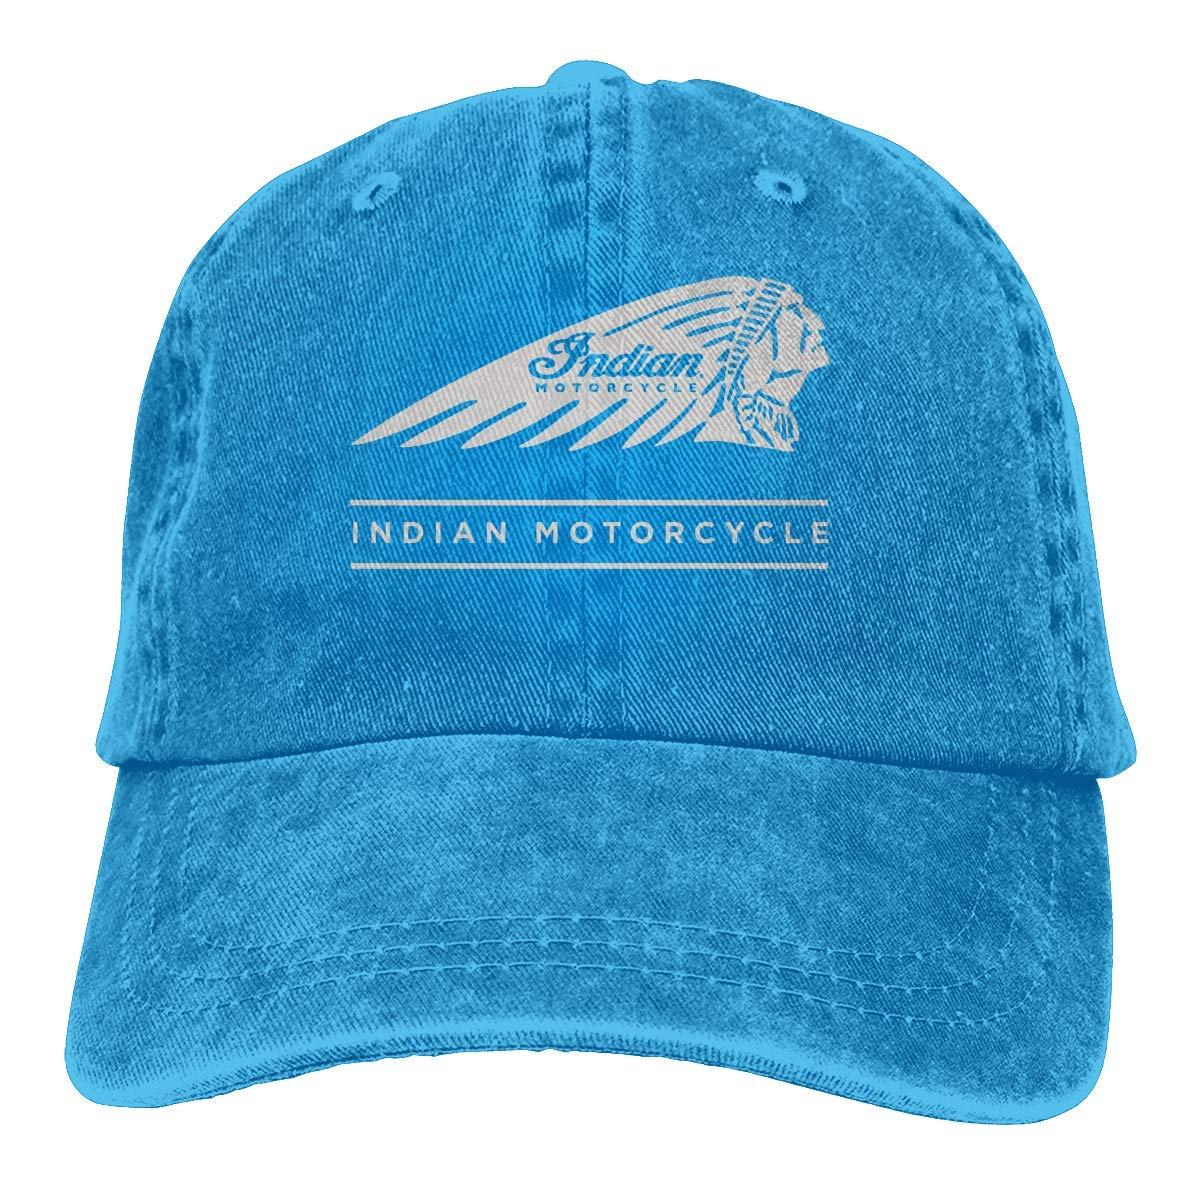 Unisex Adults Vintage Washed Baseball Cap Adjustable Dad Hat - Baorol Indian Motorcycle Adjustable Baseball Washed Cap Black